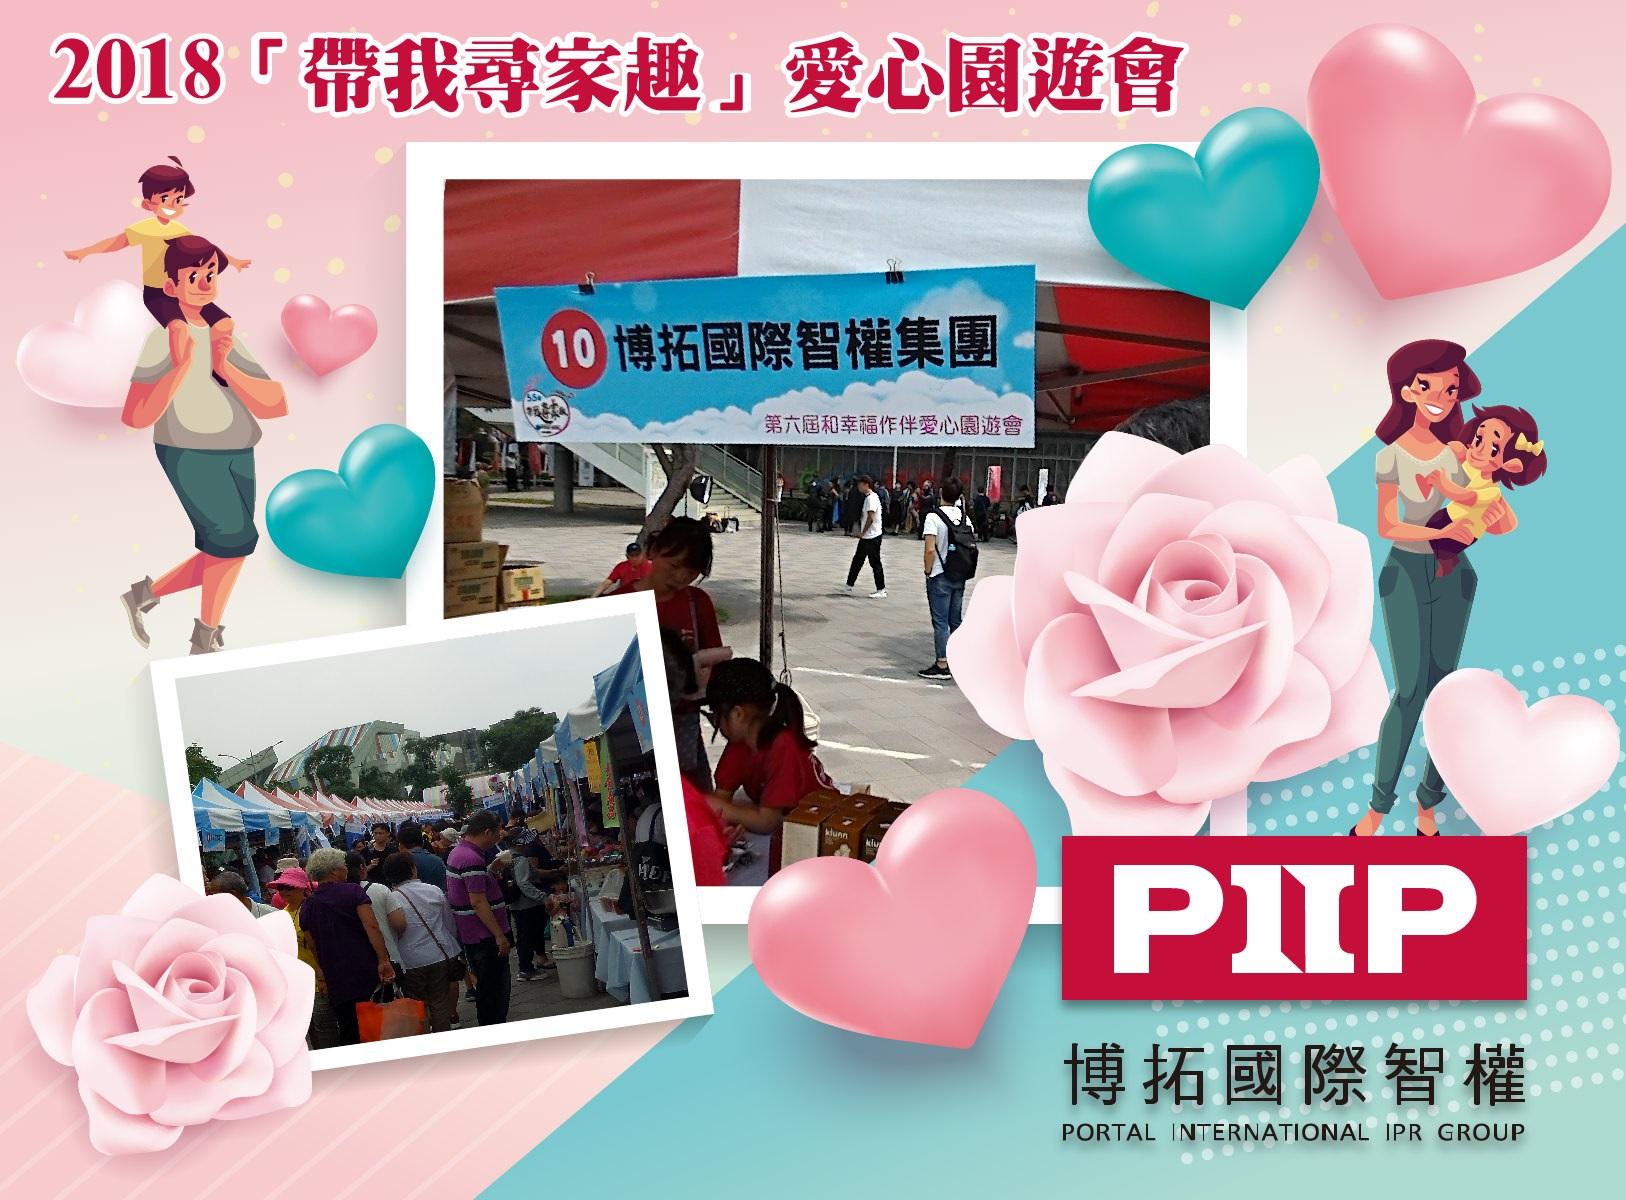 PIIP博拓國際智權集團贊助忠義育幼院設攤義賣,參與公益活動